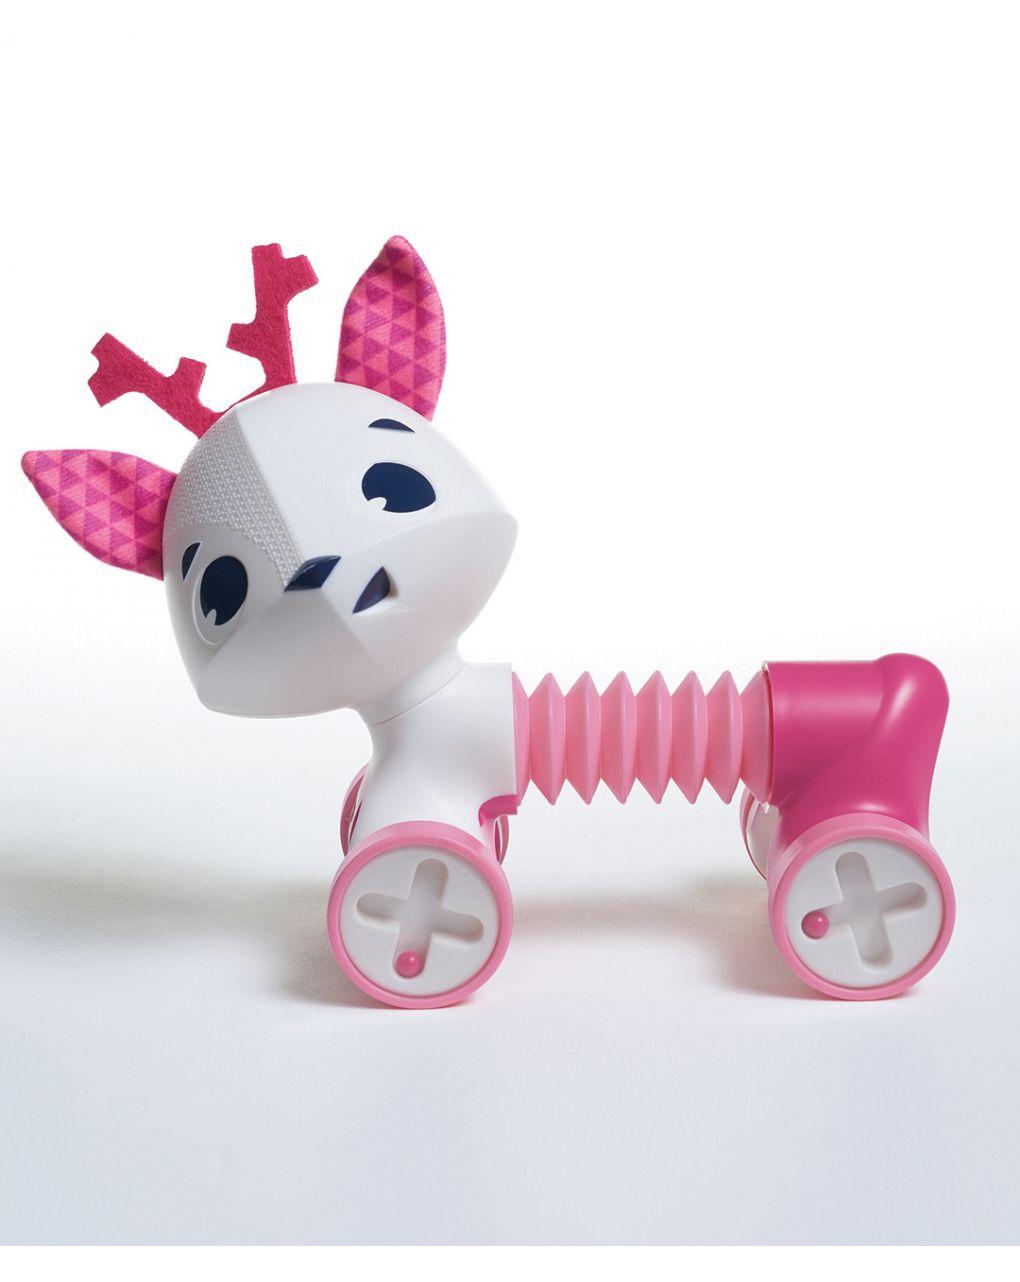 Tiny love - tiny rolling toys florence il cerbiatto - Tiny Love